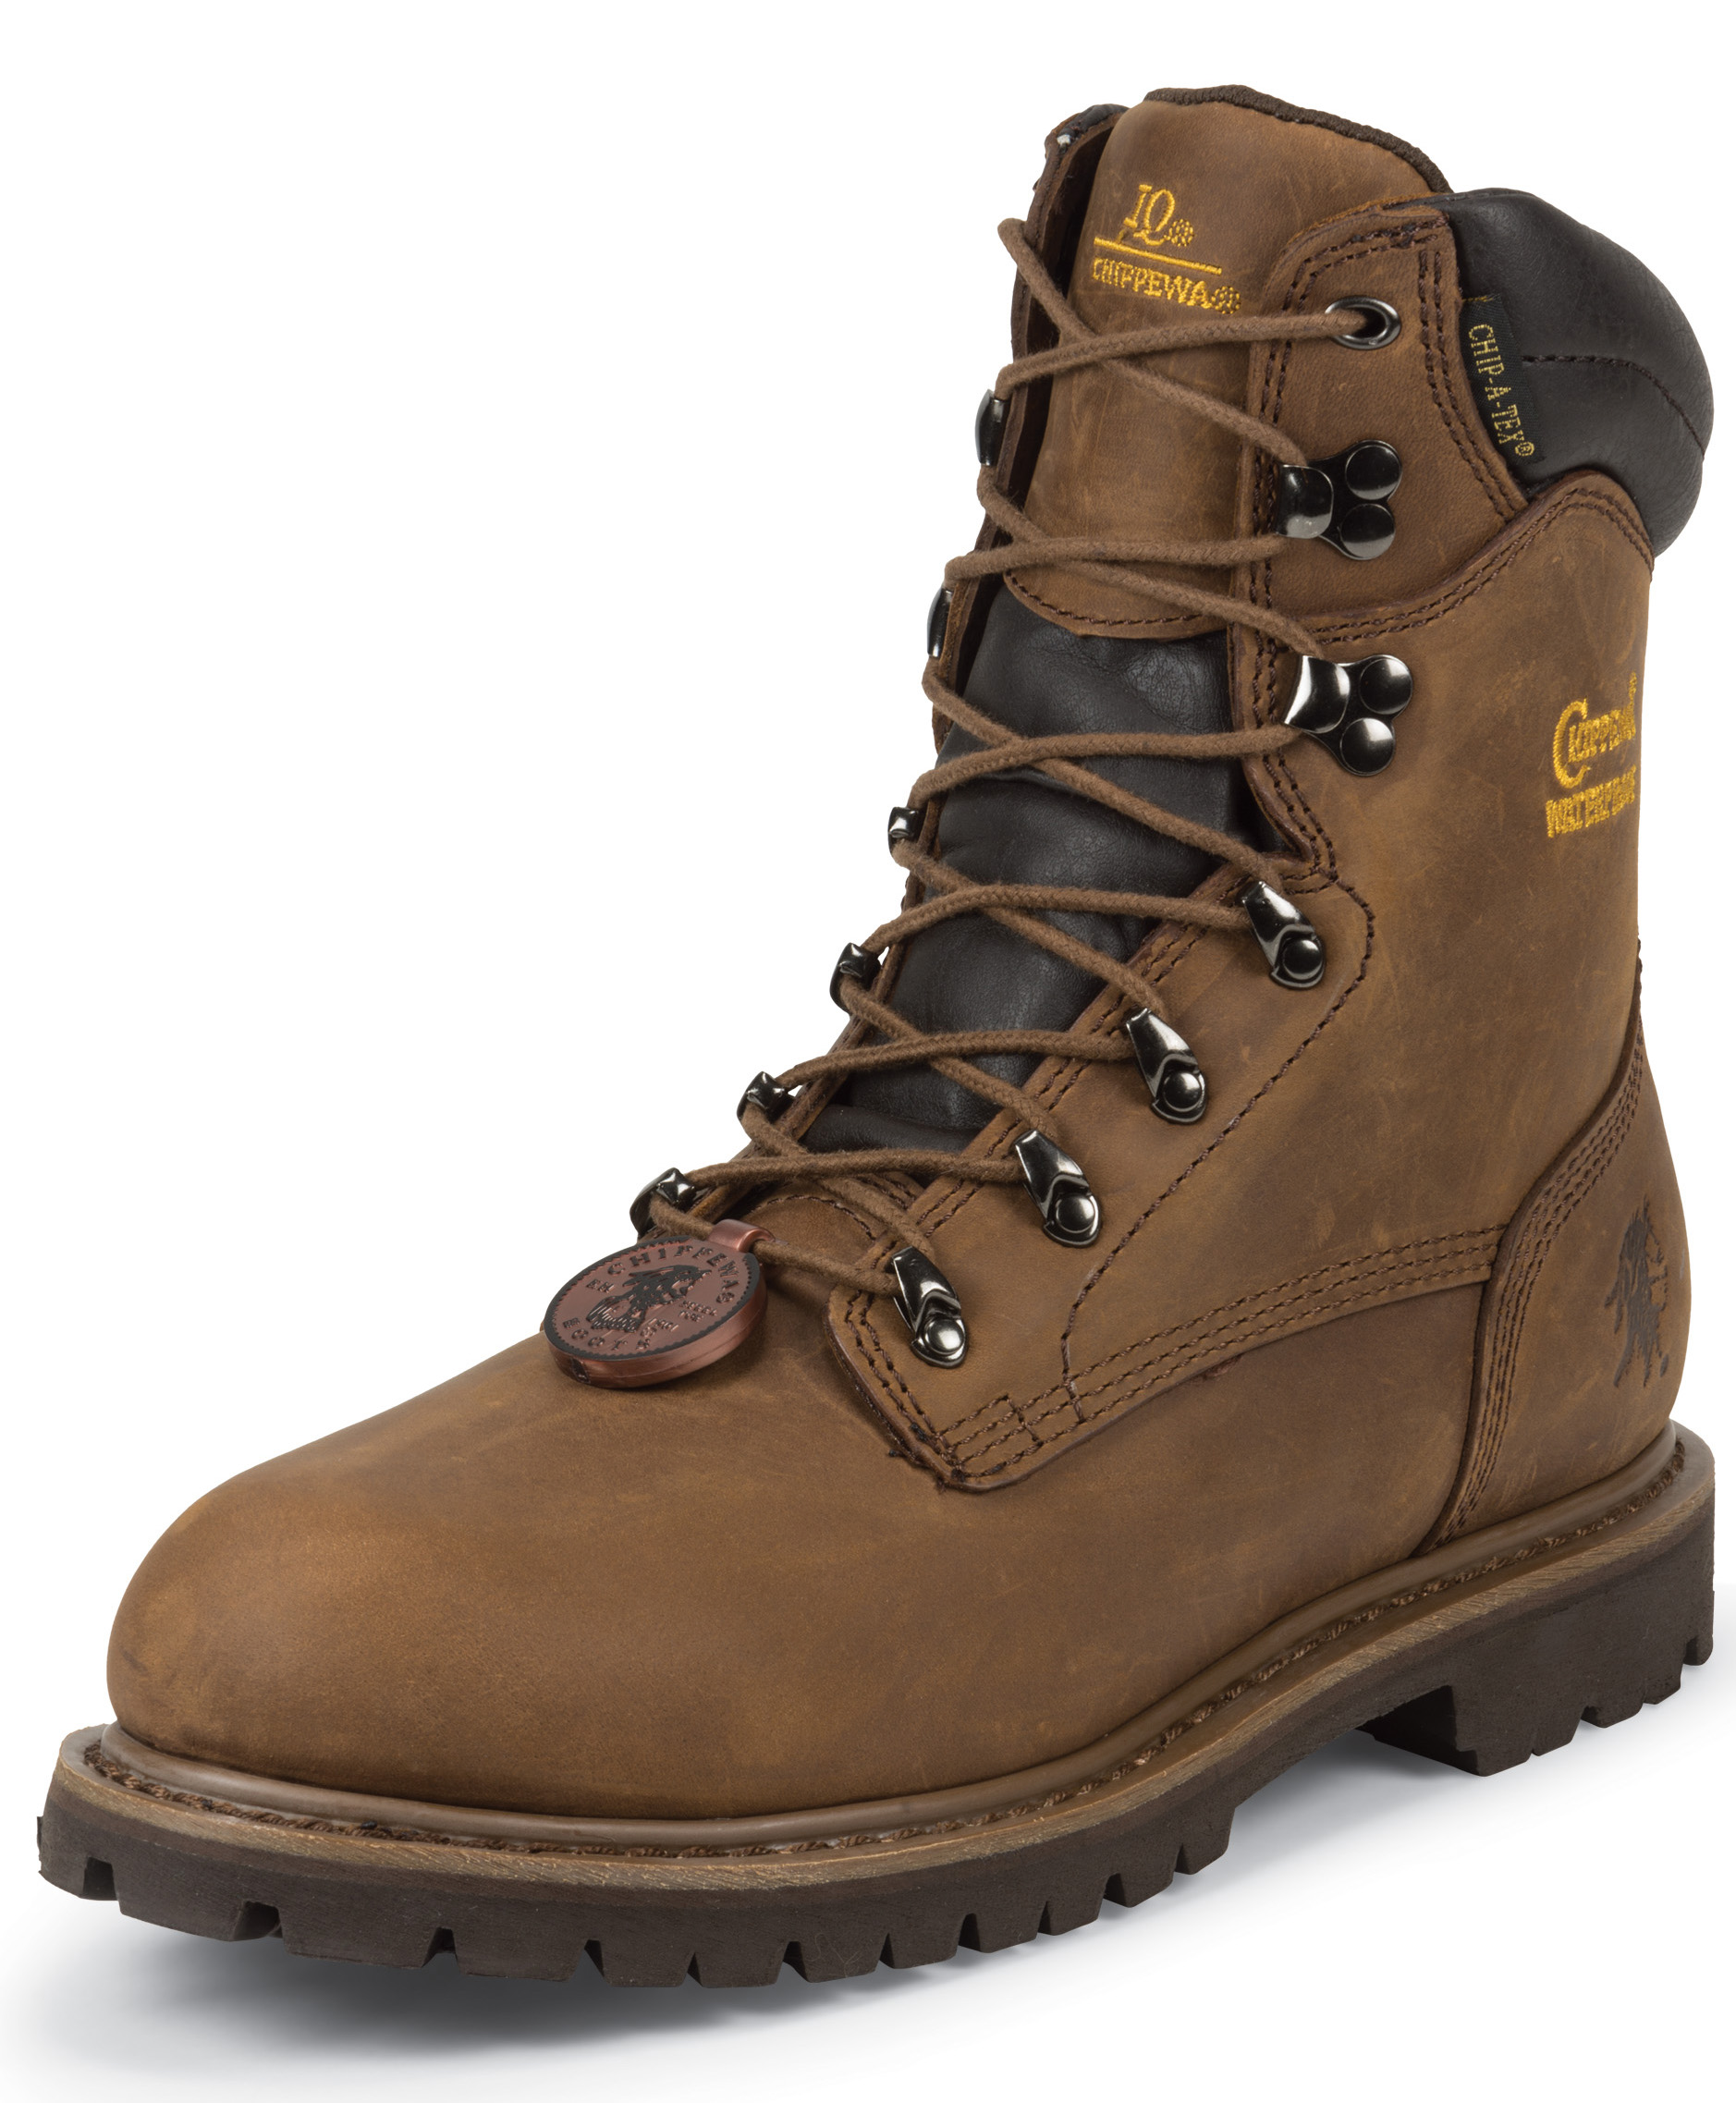 "Chippewa Chippewa Mens 8"" Heavy Duty Tough Bark WP Lug Boot Steel Toe 55069 Extra Wide"